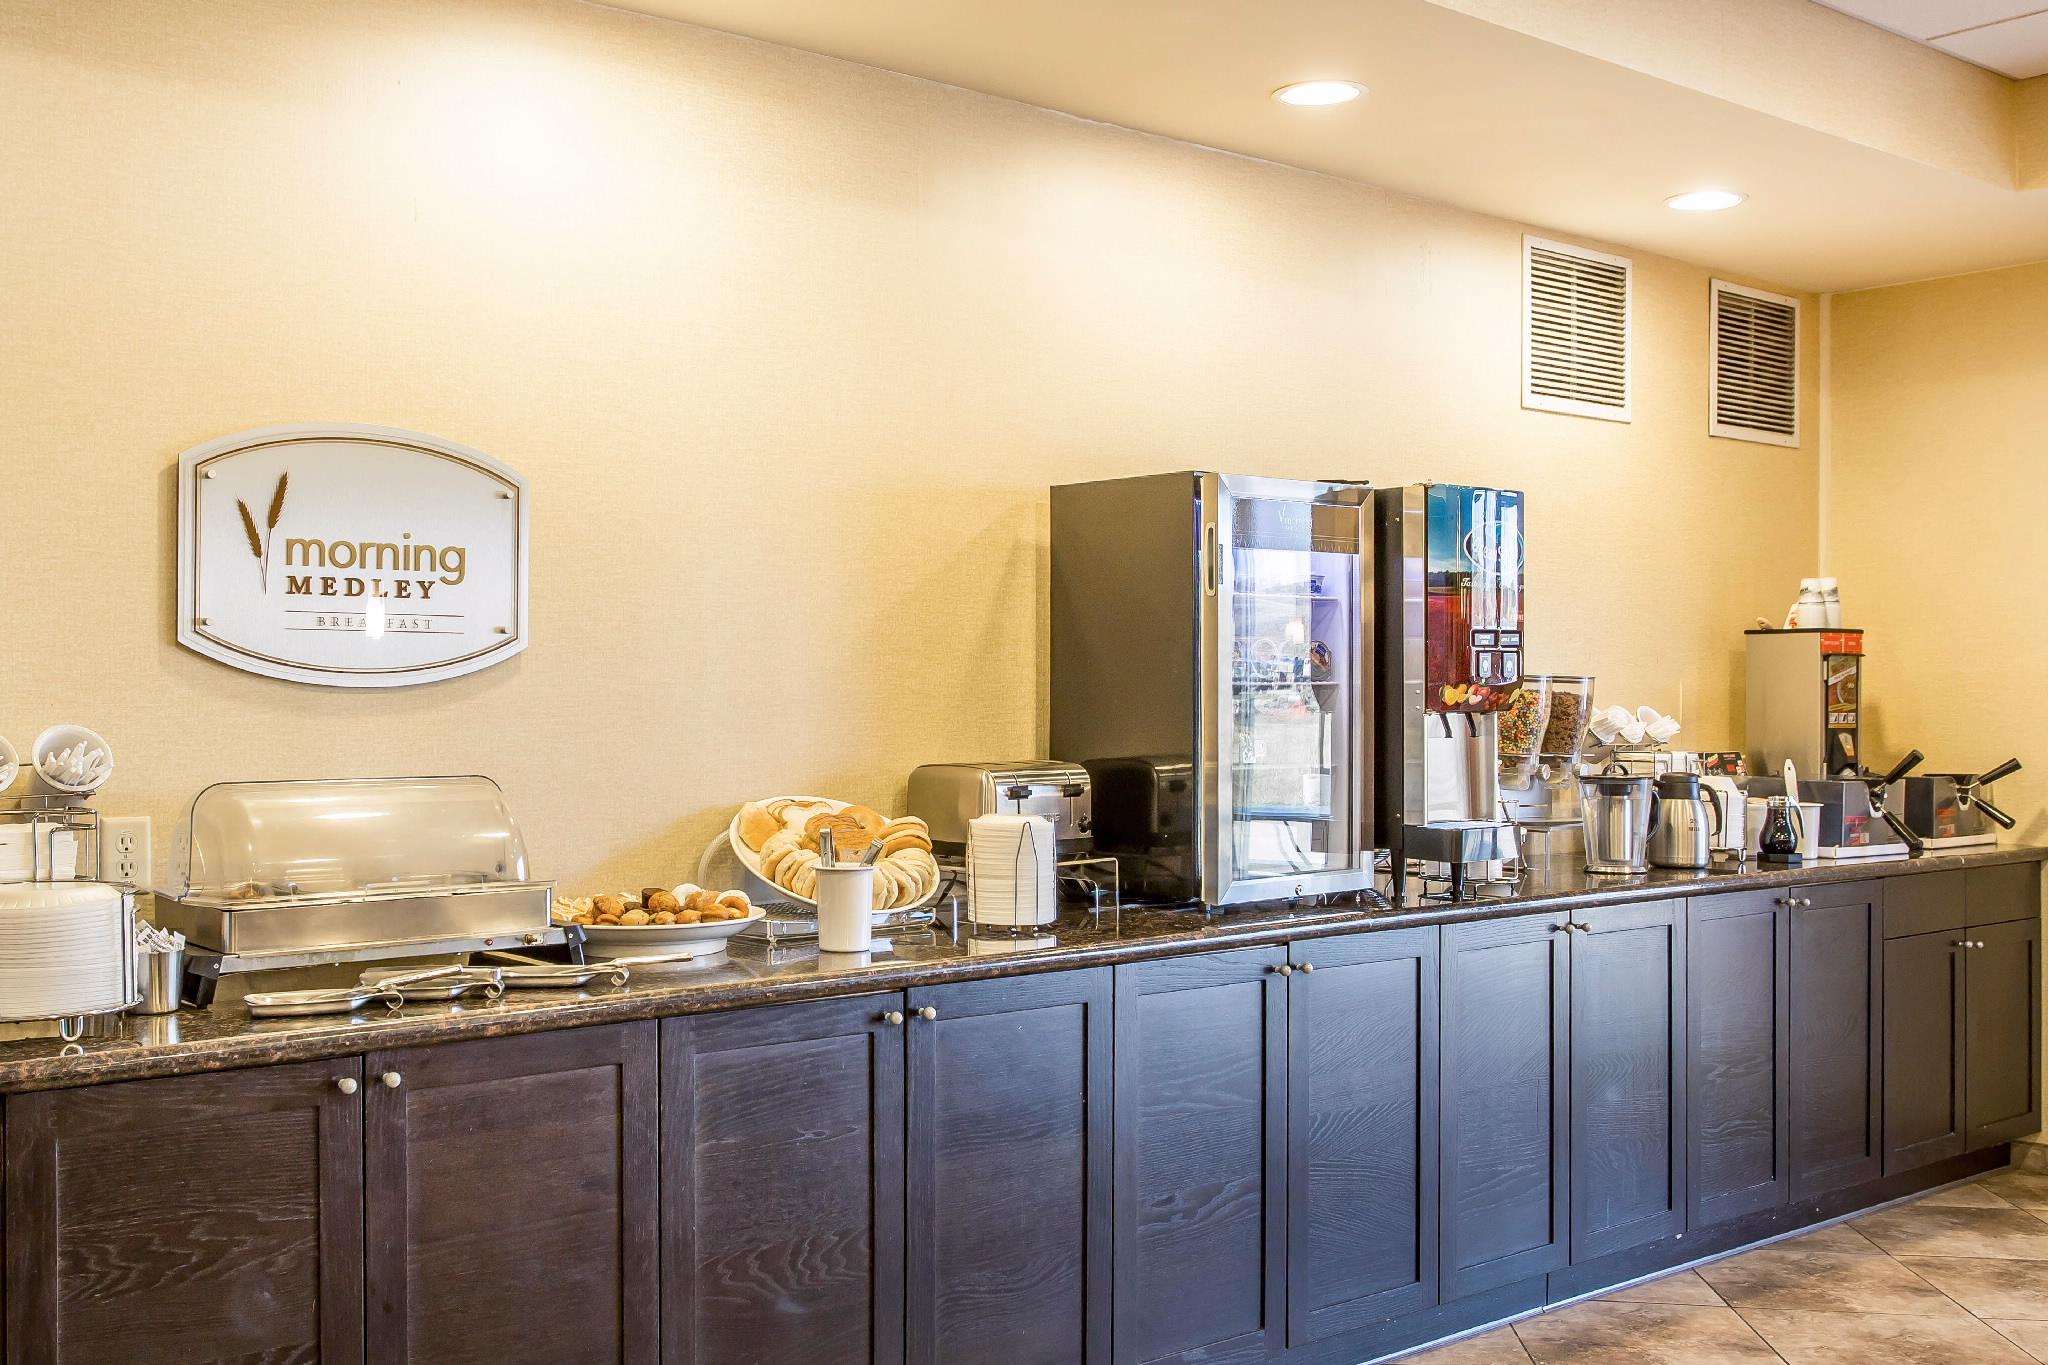 Sleep Inn & Suites, Rapid City SD